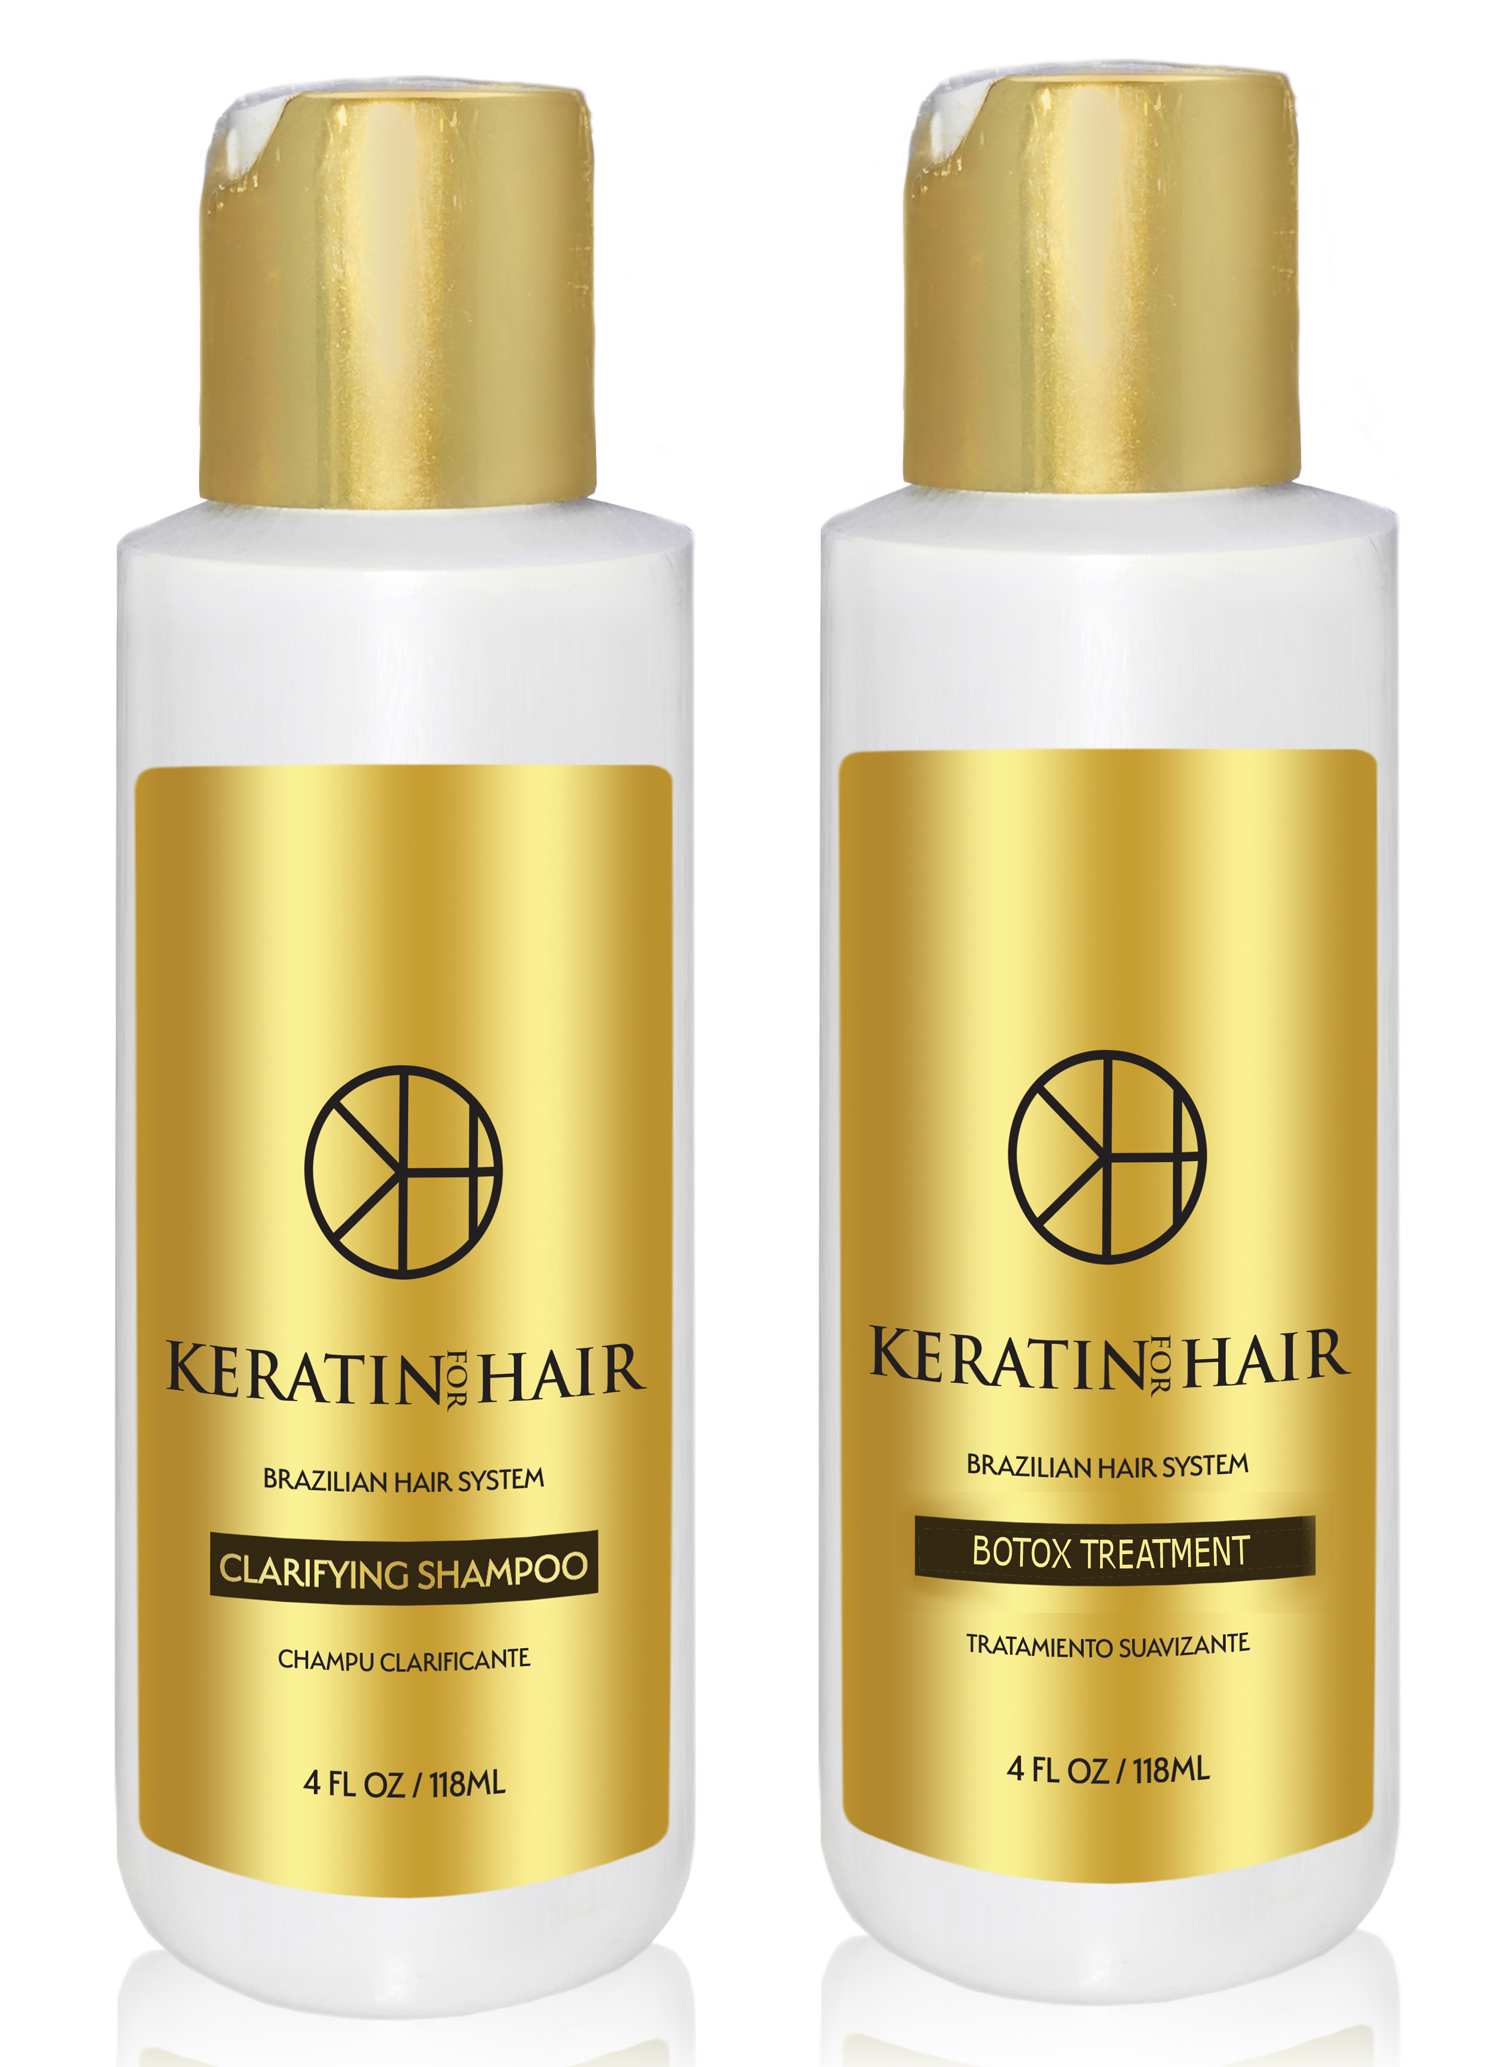 Keratin For Hair B O T O X Miracle Capilar Protein Keratin 4 Ounces 2 Piece Kit Hair Treatment Enhanced Formula For Blonde Thin Fragile Hair Straighten Smooths Moisturizer Walmart Com Walmart Com